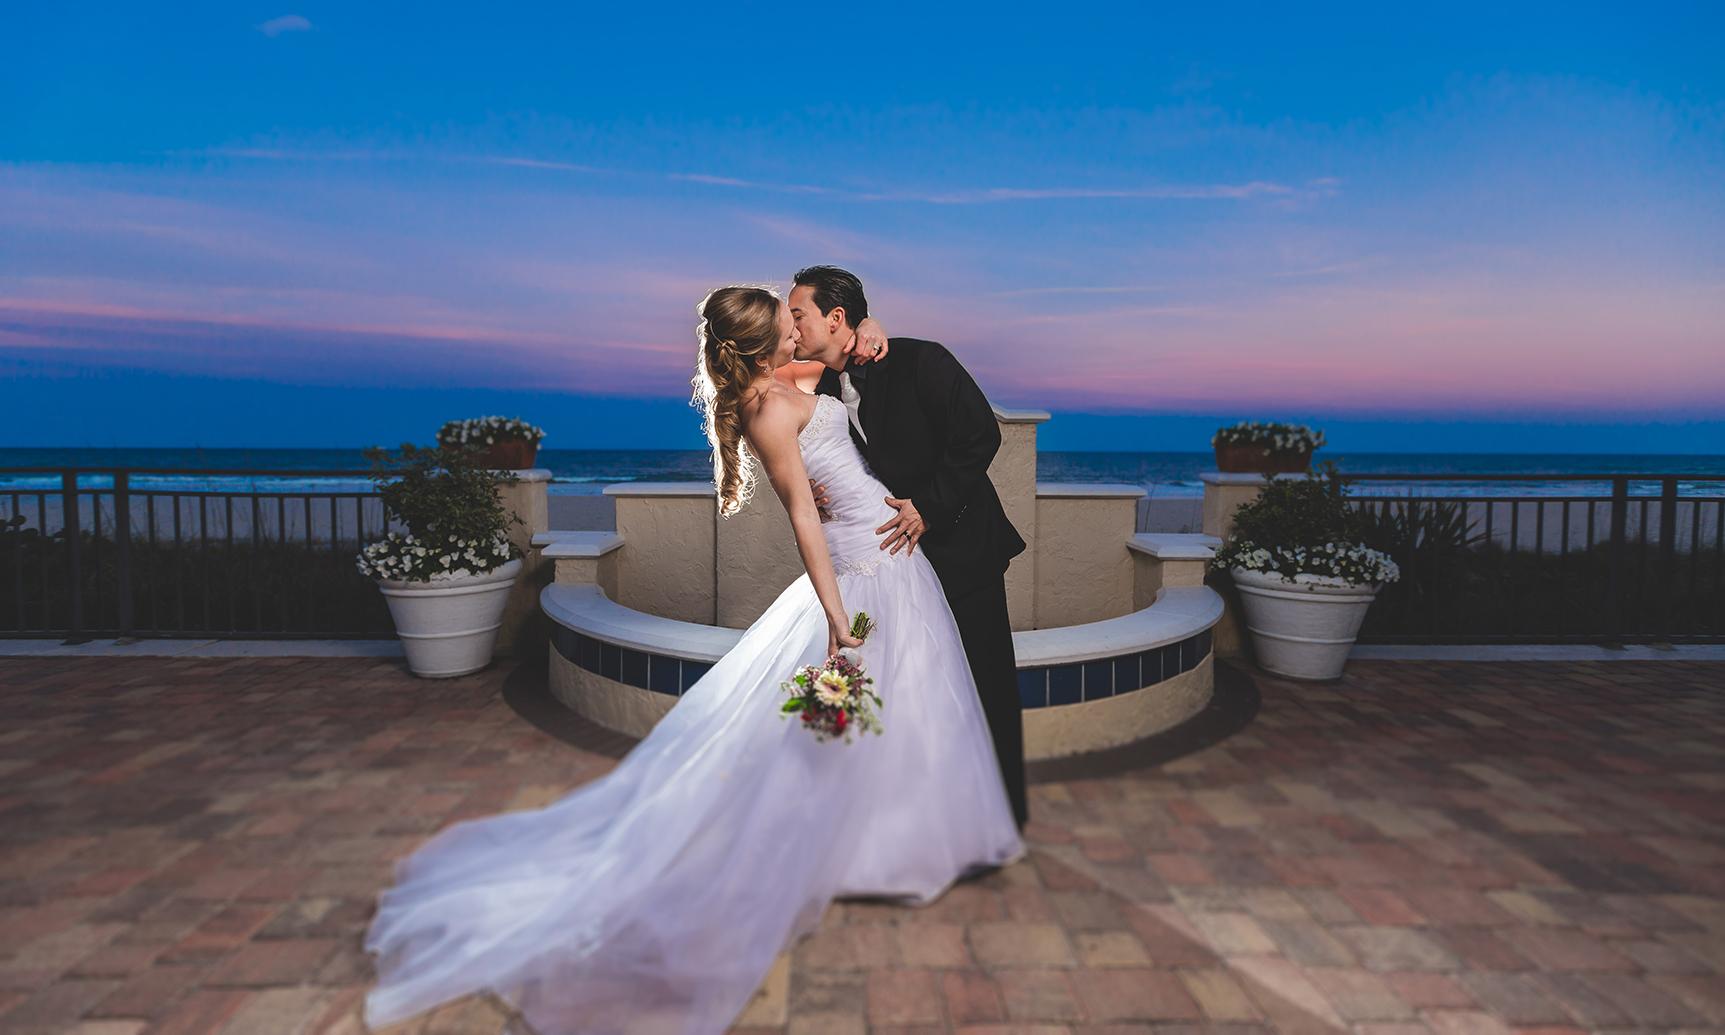 adam-szarmack-wedding-sunset-dip-kiss.jpg